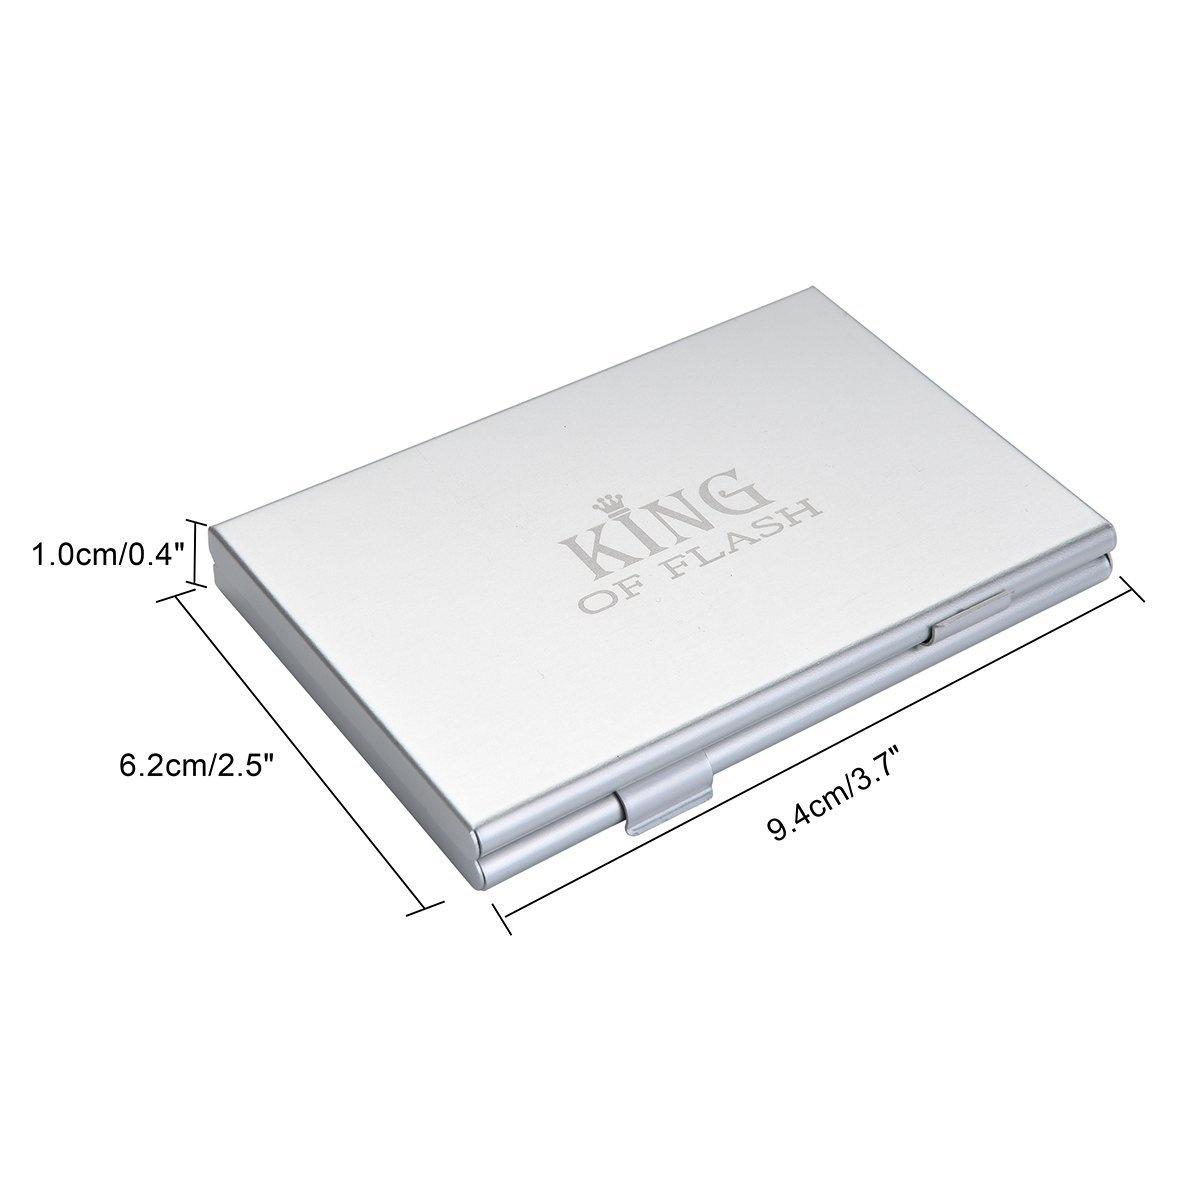 4 x Nano SIM 4 x Micro SIM PROfoto.Trend//JJC Water Resistant Mini Memory Card Carrying Case for 4 x SIM Includes 1 x SIM Tray Ejector Tool Blue